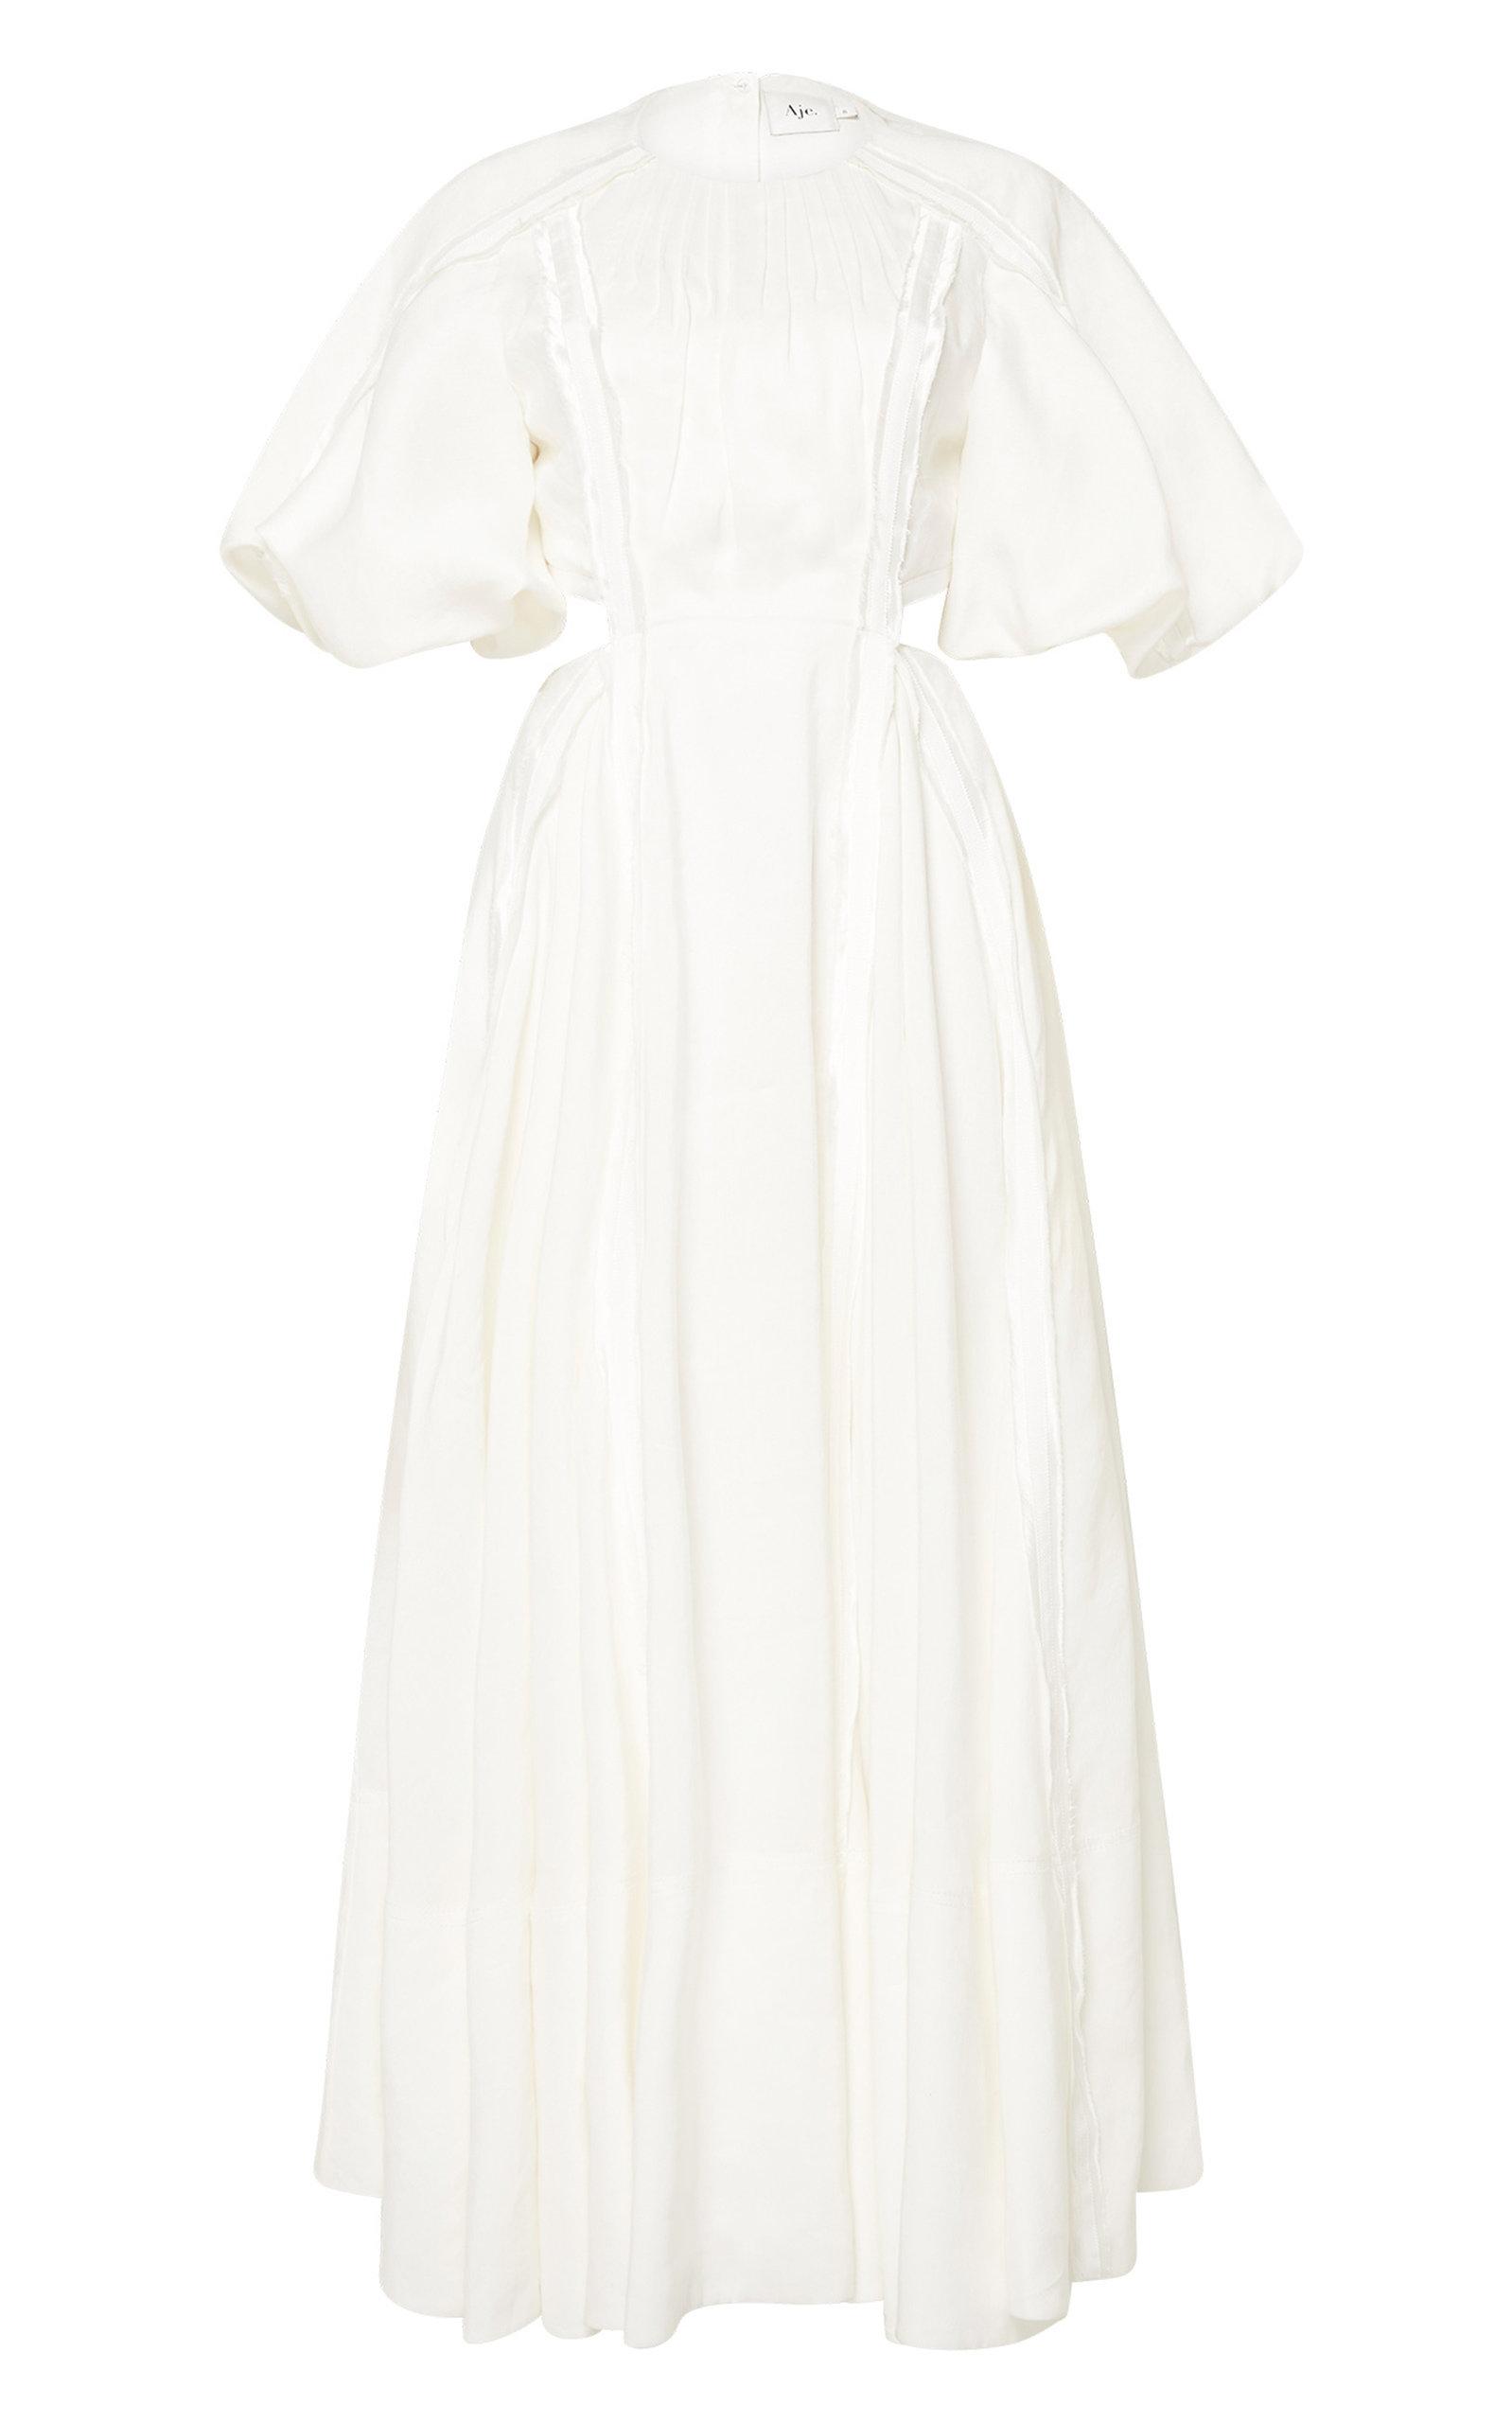 - Women's Revitalize Cutout Linen-Blend Midi Dress